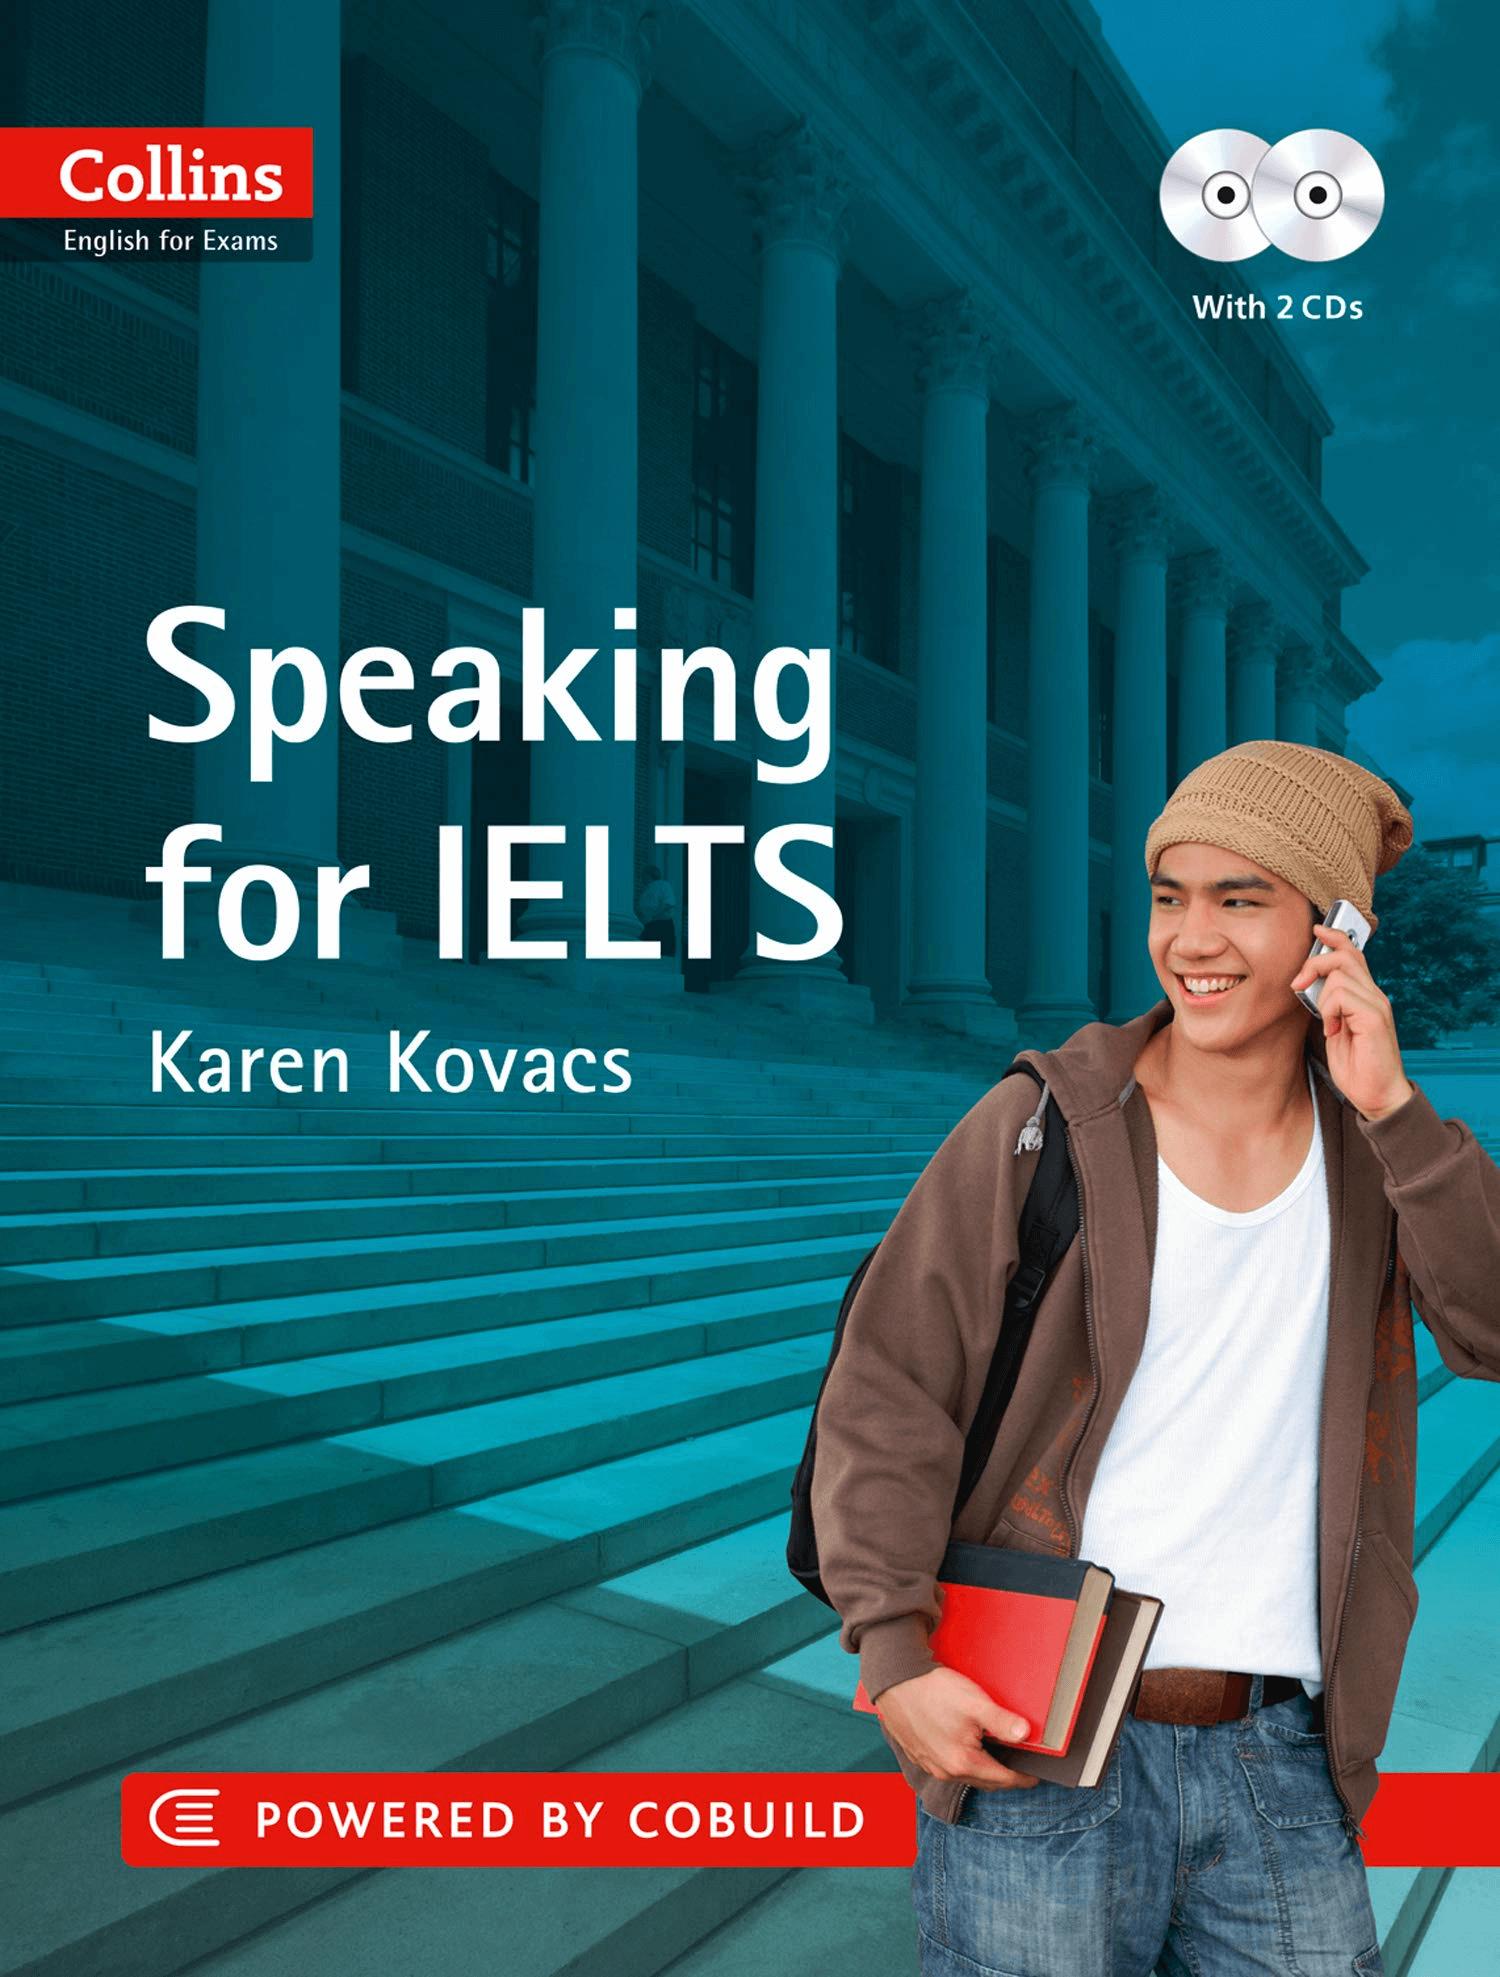 Collins Speaking for IELTS pdf